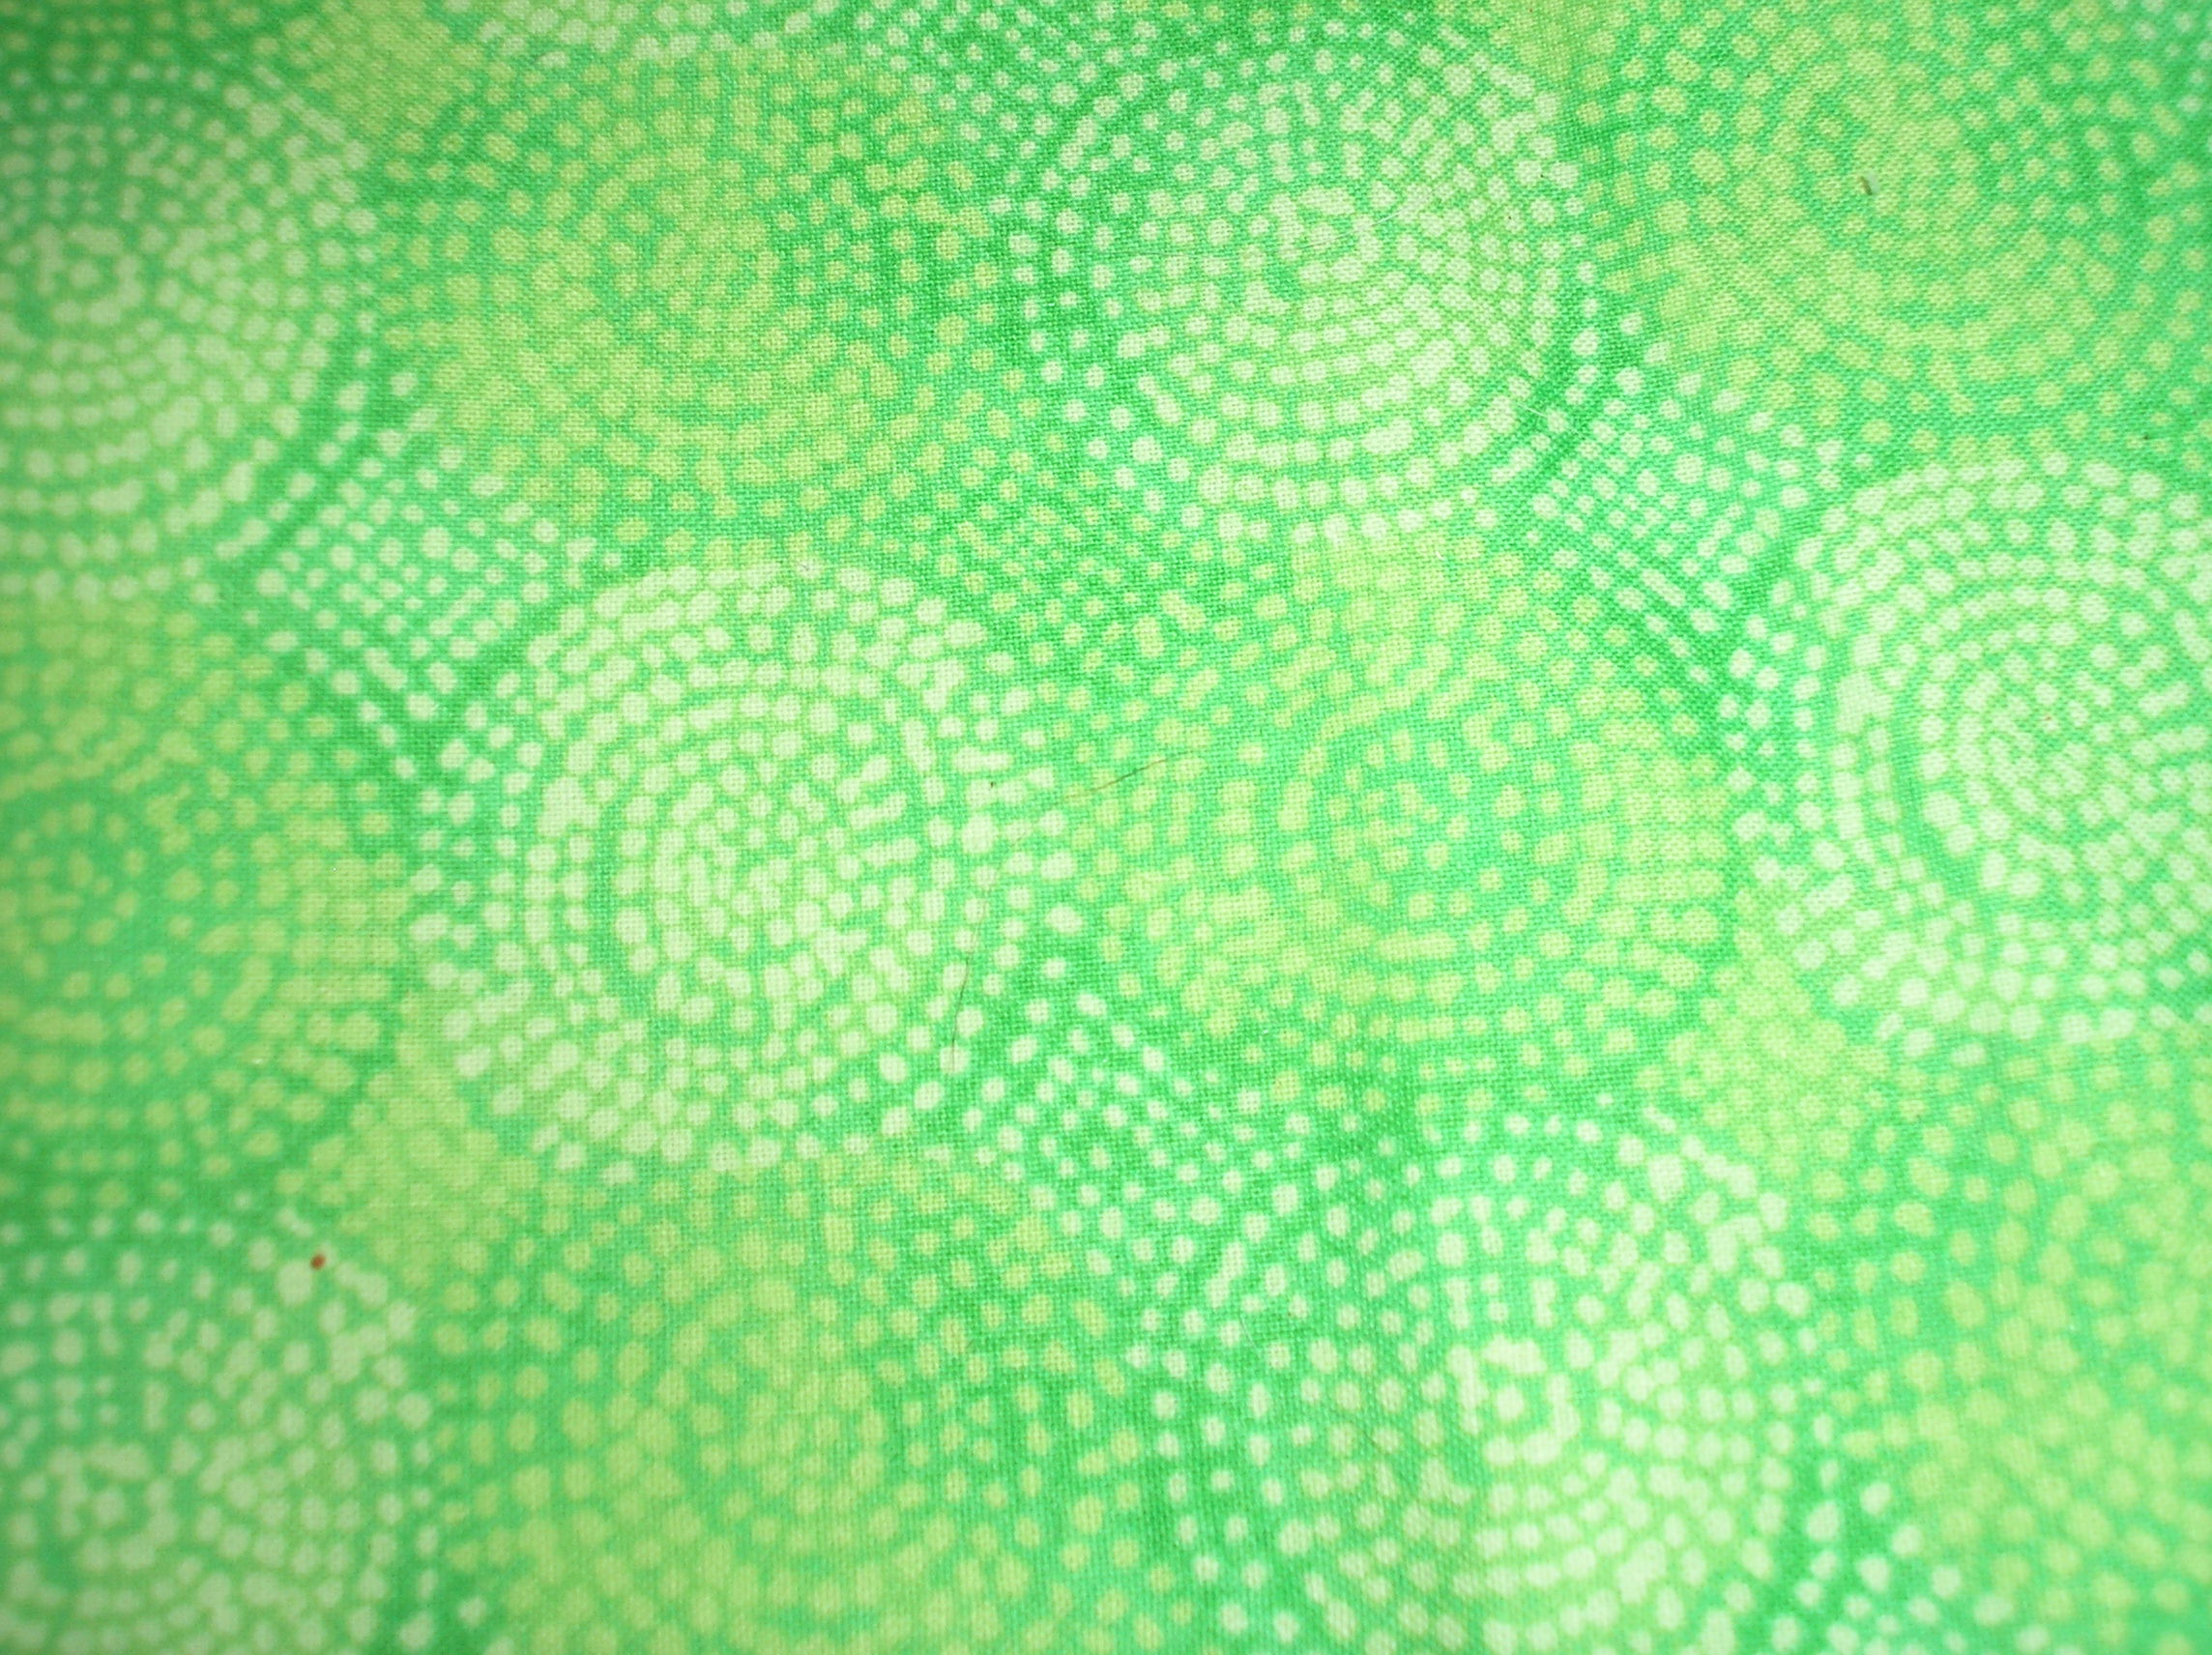 Circular, swirl design in many colors